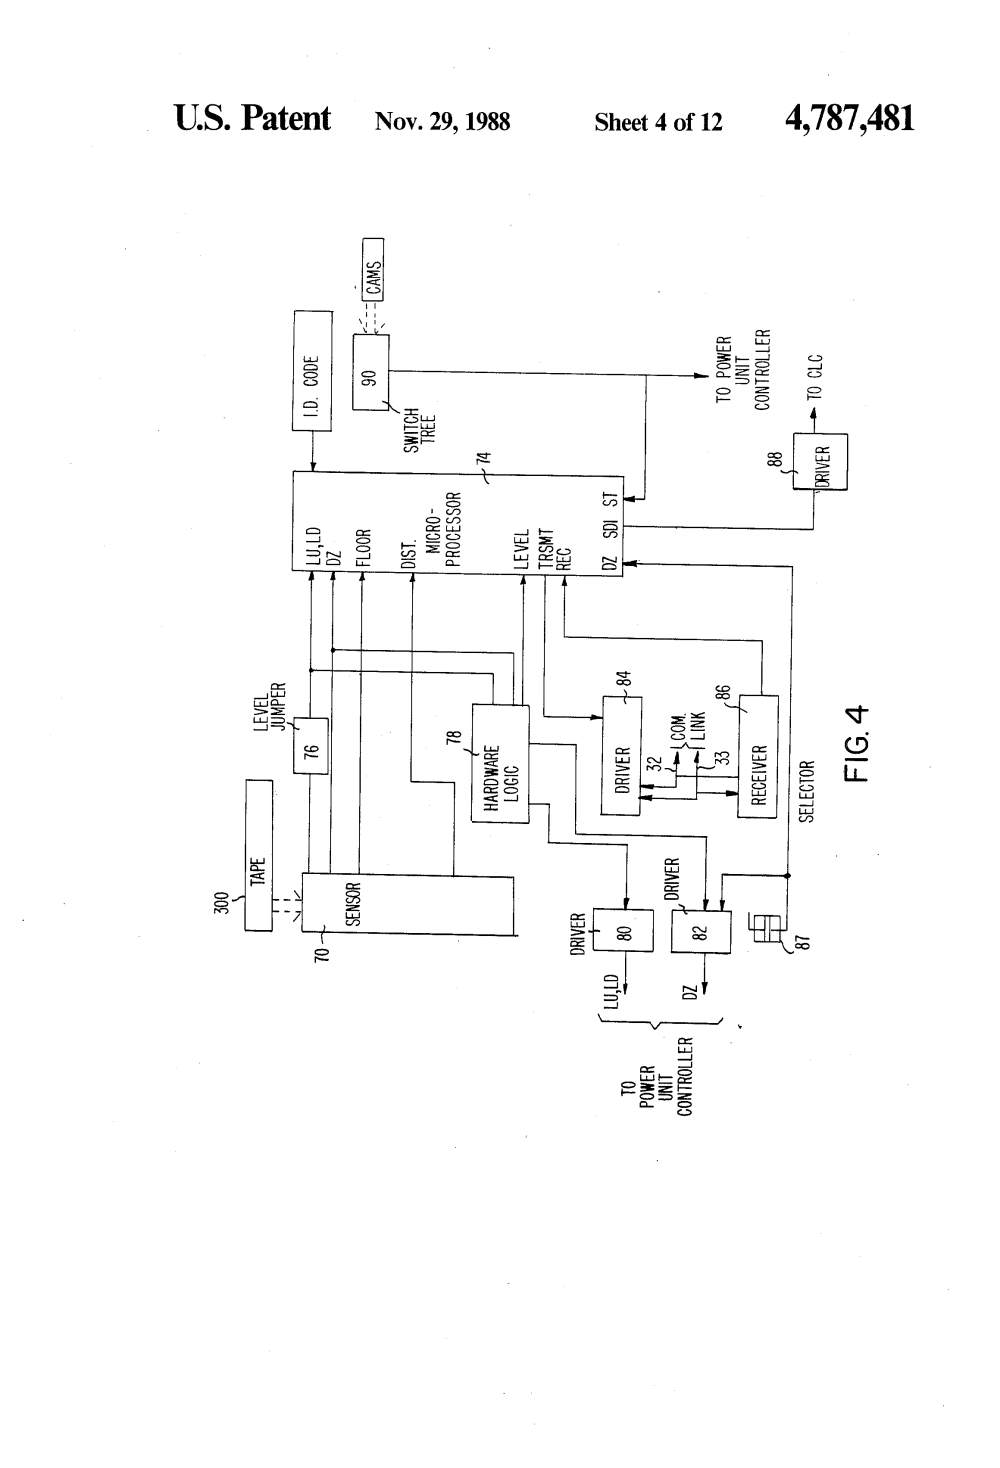 medium resolution of car hydraulic wiring diagram wiring diagram third levelhydraulic control wiring diagram get free image about wiring